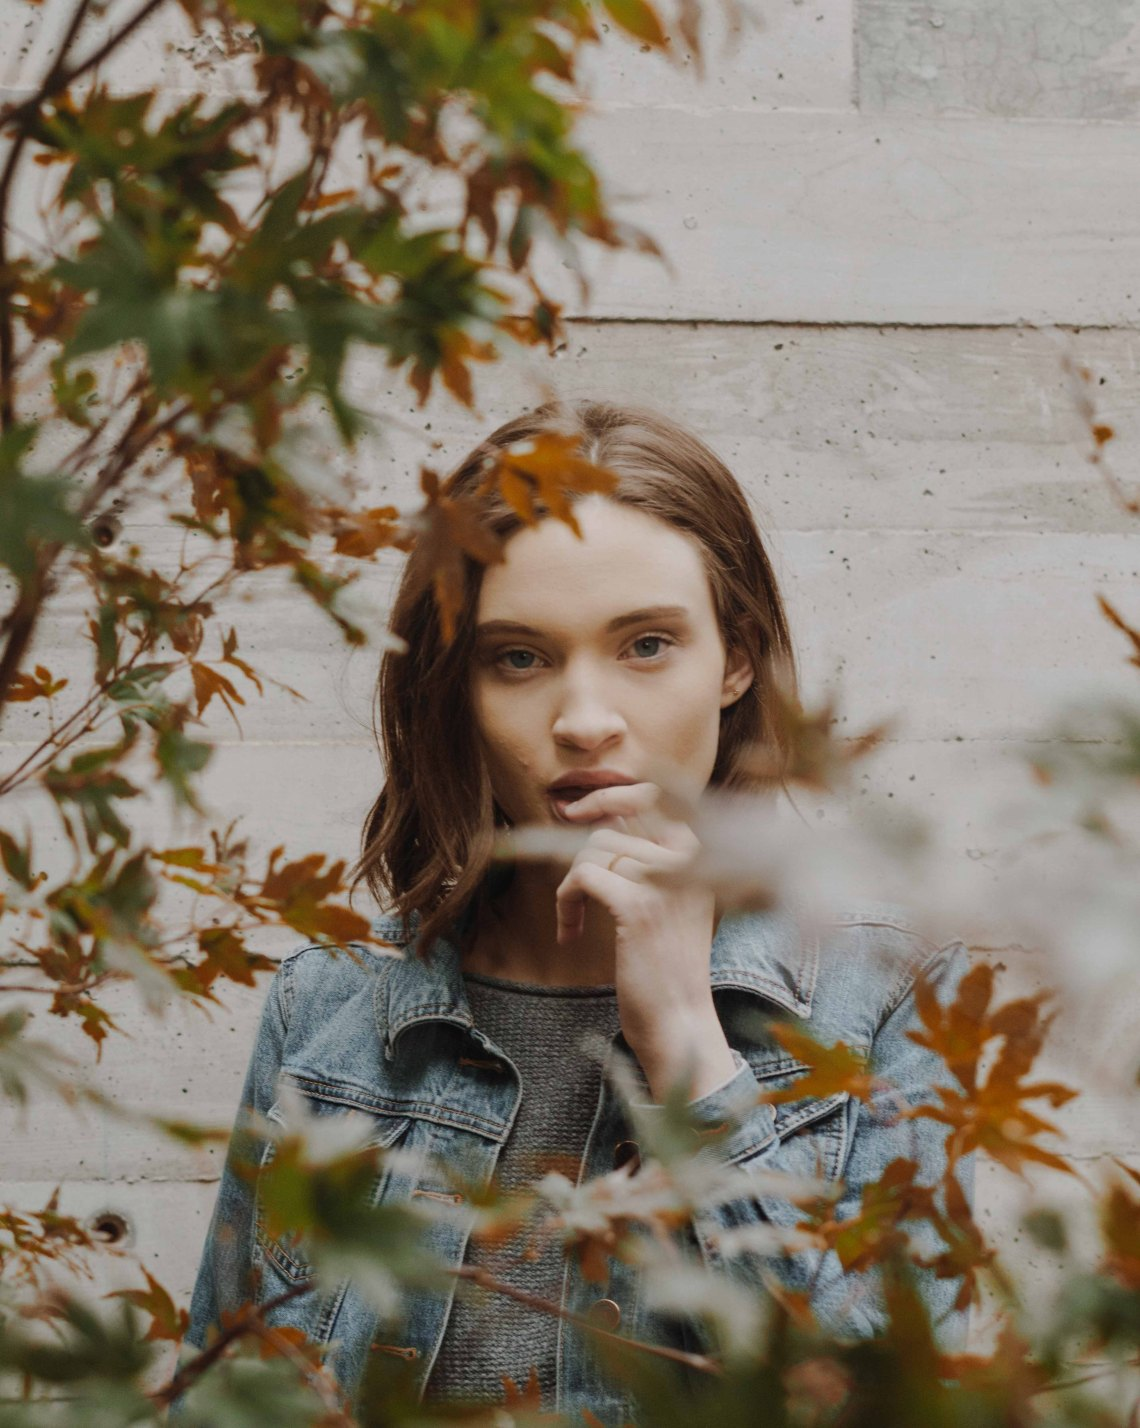 Woman peering from behind the leaves